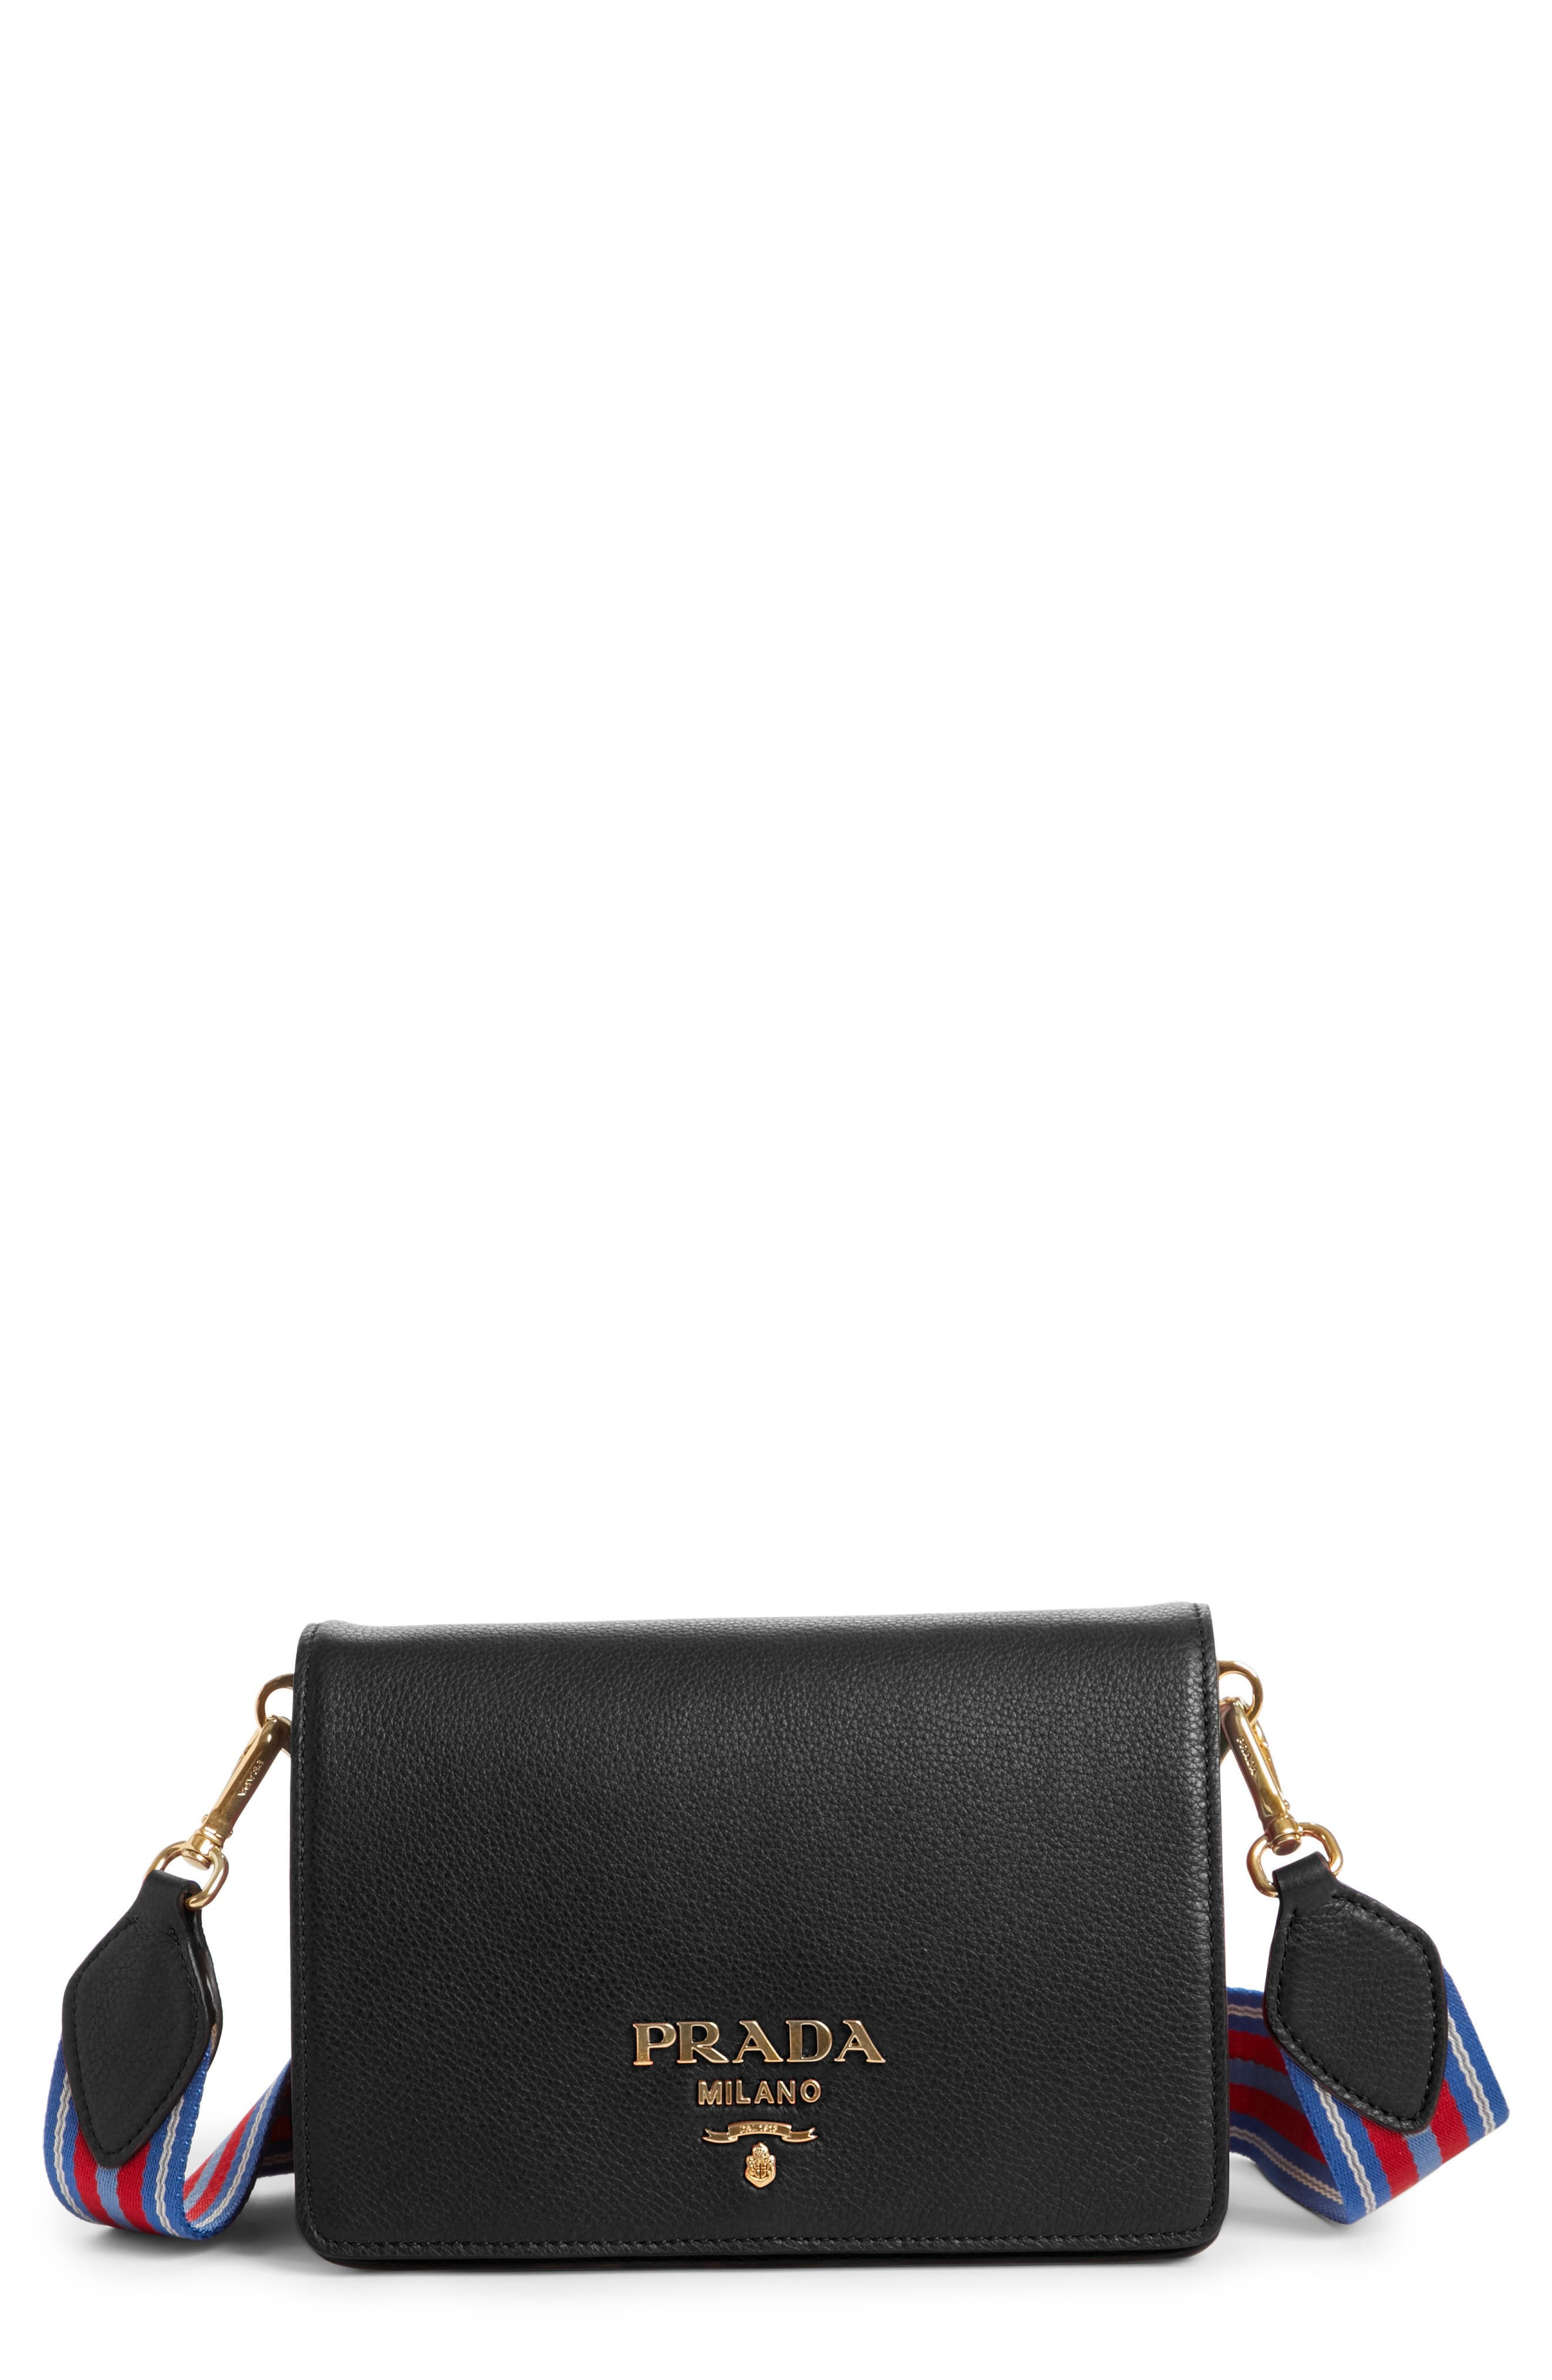 Prada Vitello Daino Double Compartment Leather Shoulder Bag